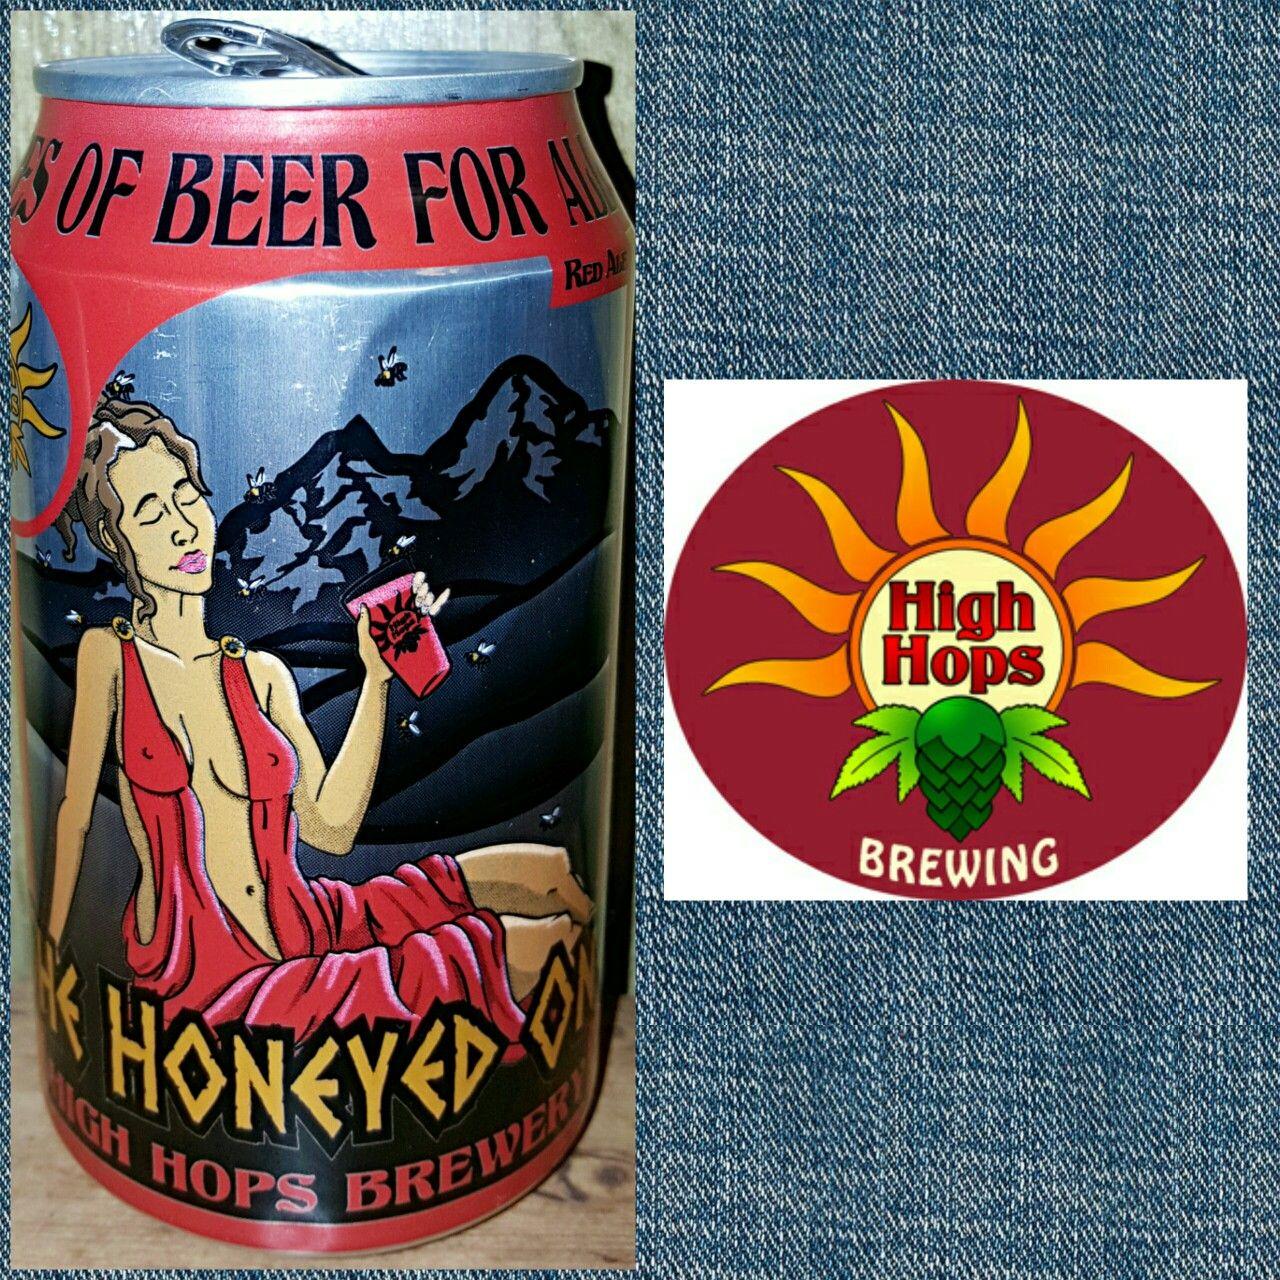 The Honeyed One Red Ale High Hops Brewing Windsor Co 810 B Craftbeer Beer Craft Beer Beer Beer Can